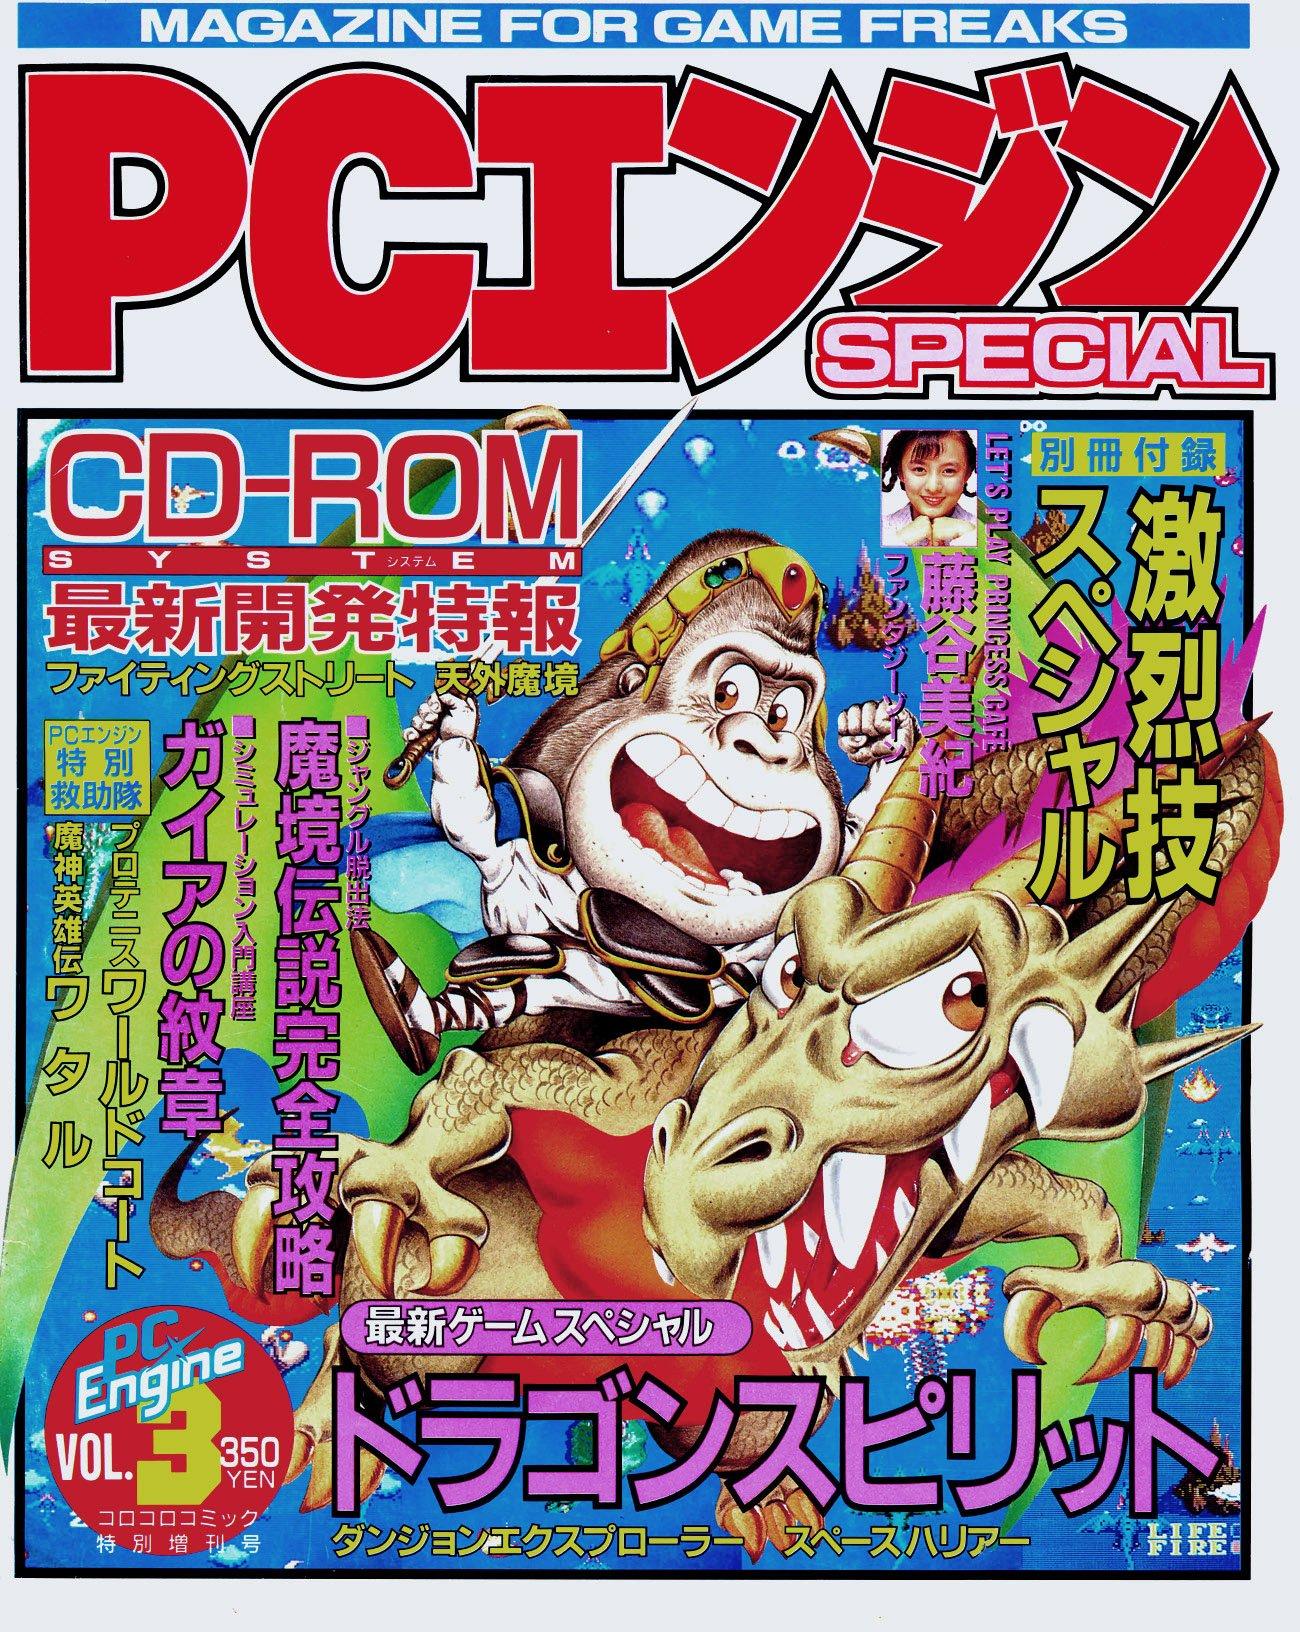 Gekkan PC Engine Special Vol.3 (October 1988)